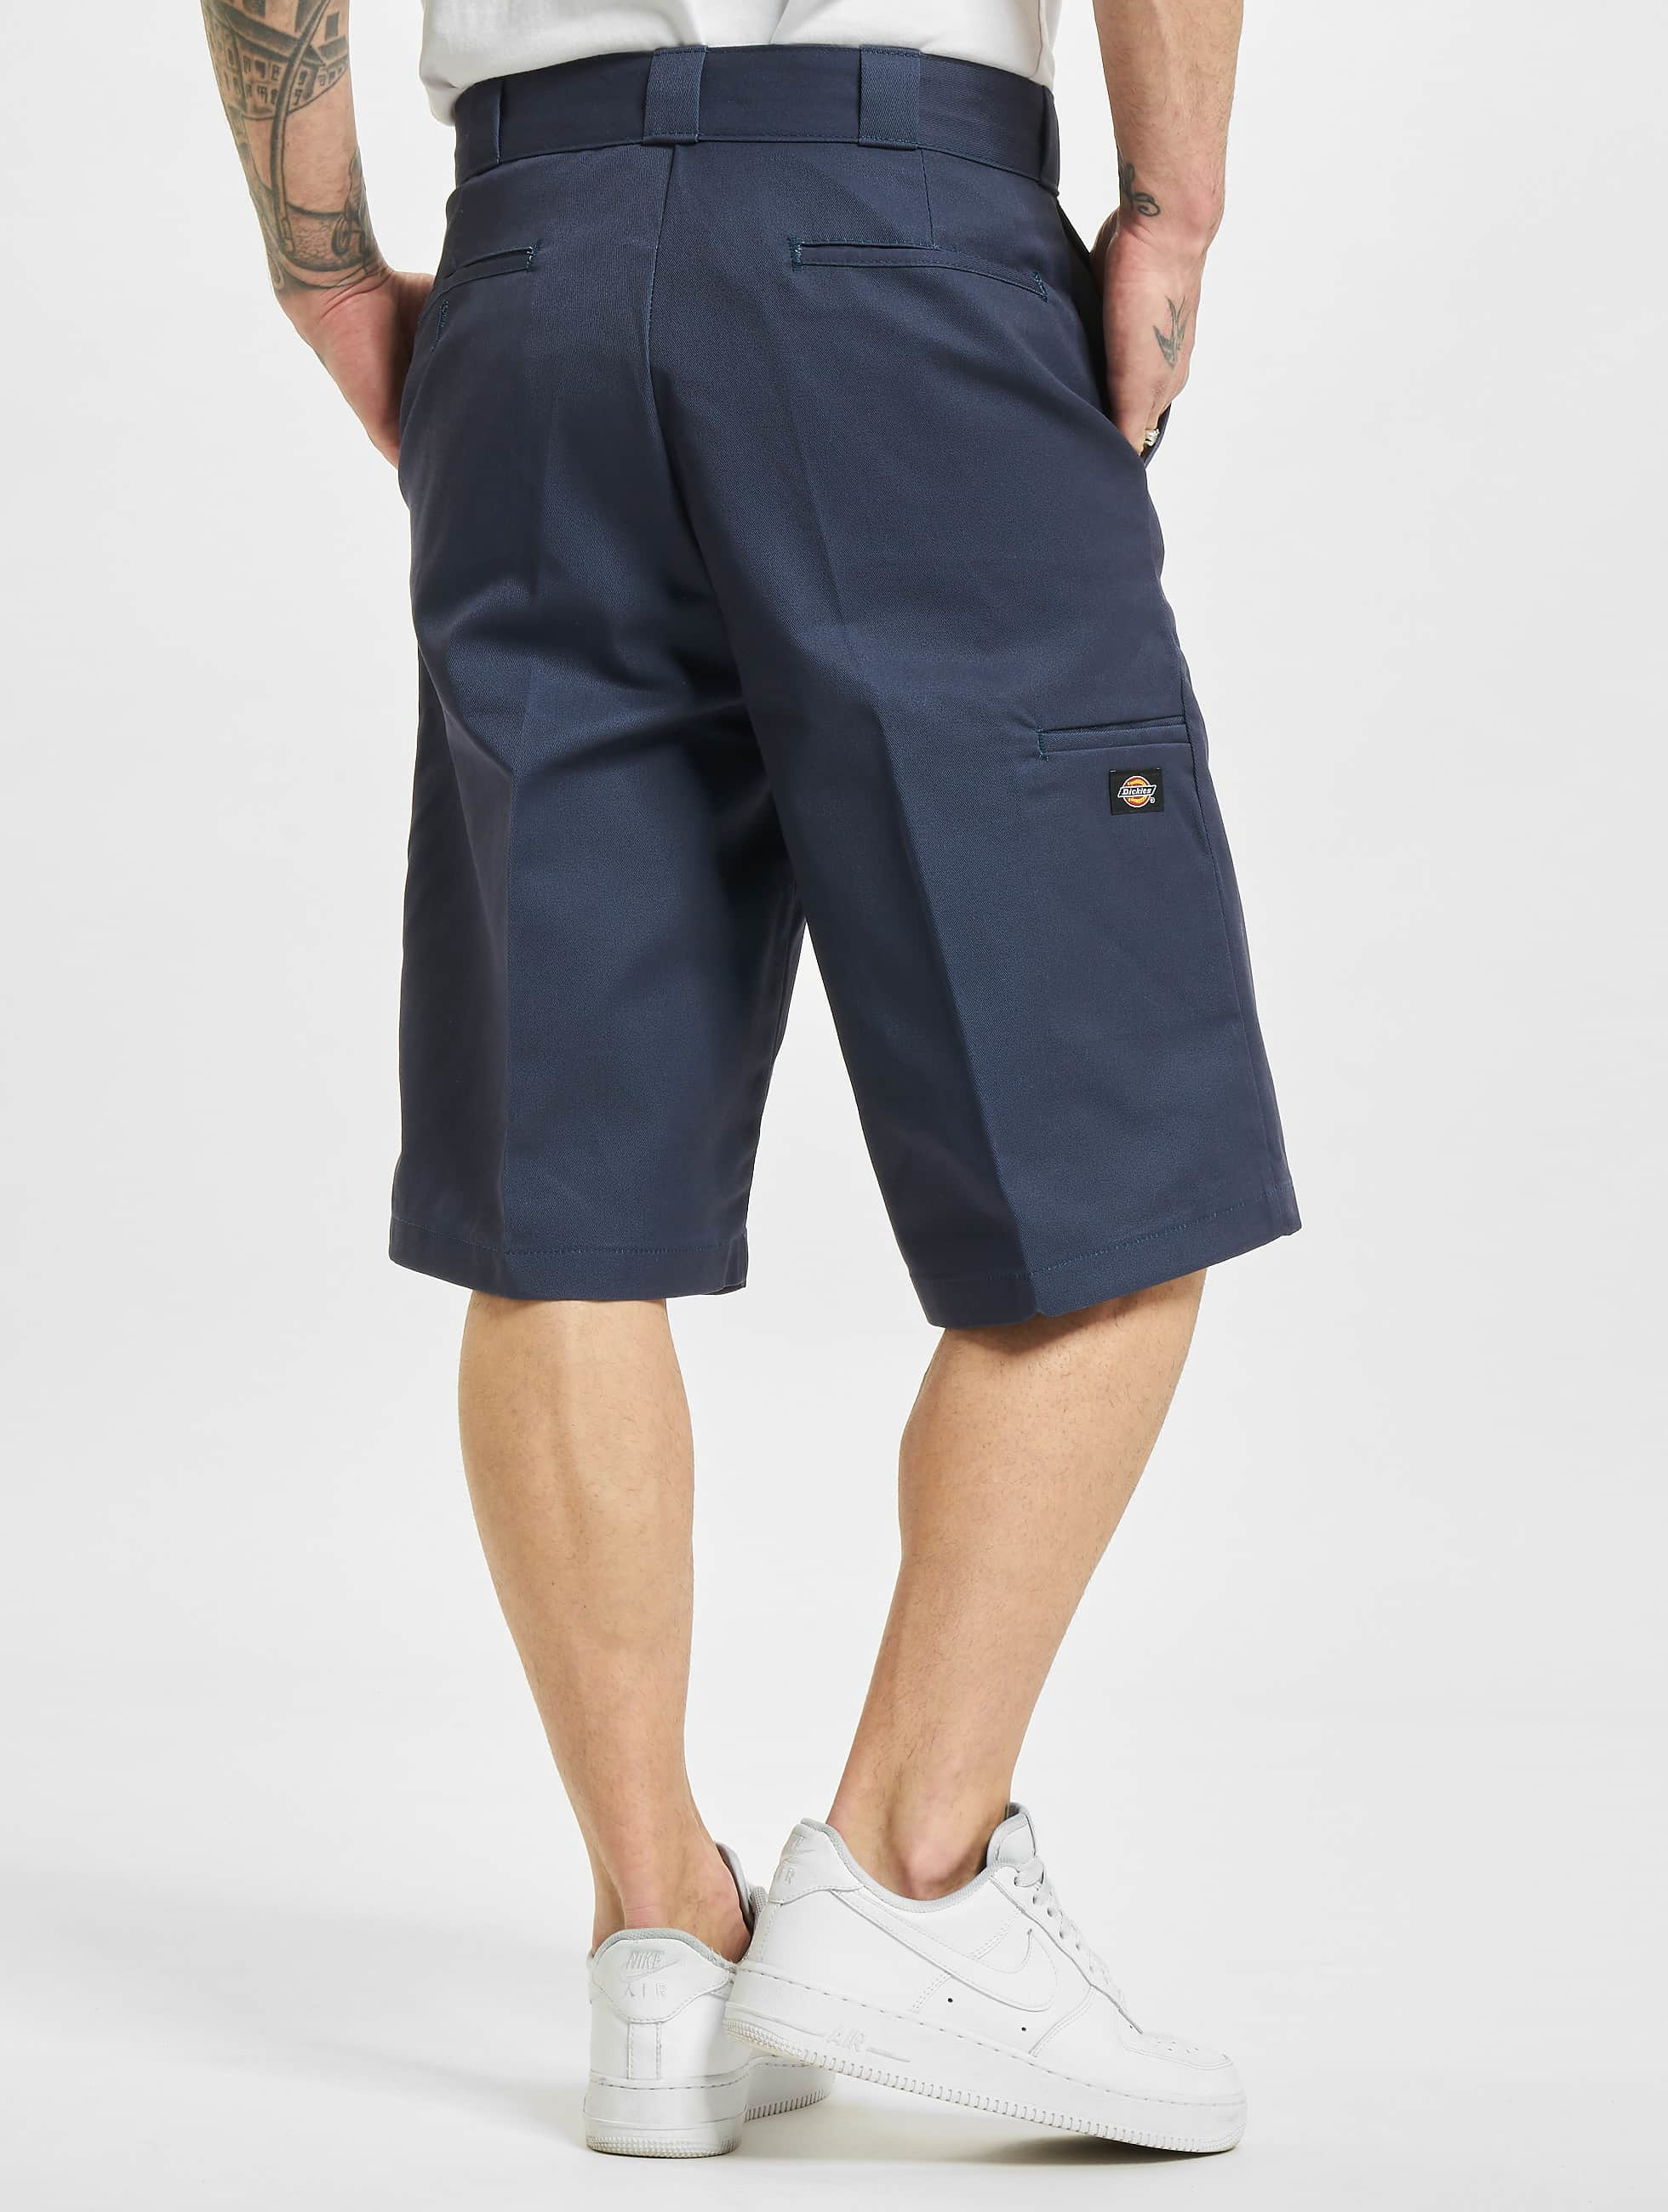 "Dickies shorts ""13"""" Multi-Use Pocket Work"" blauw"